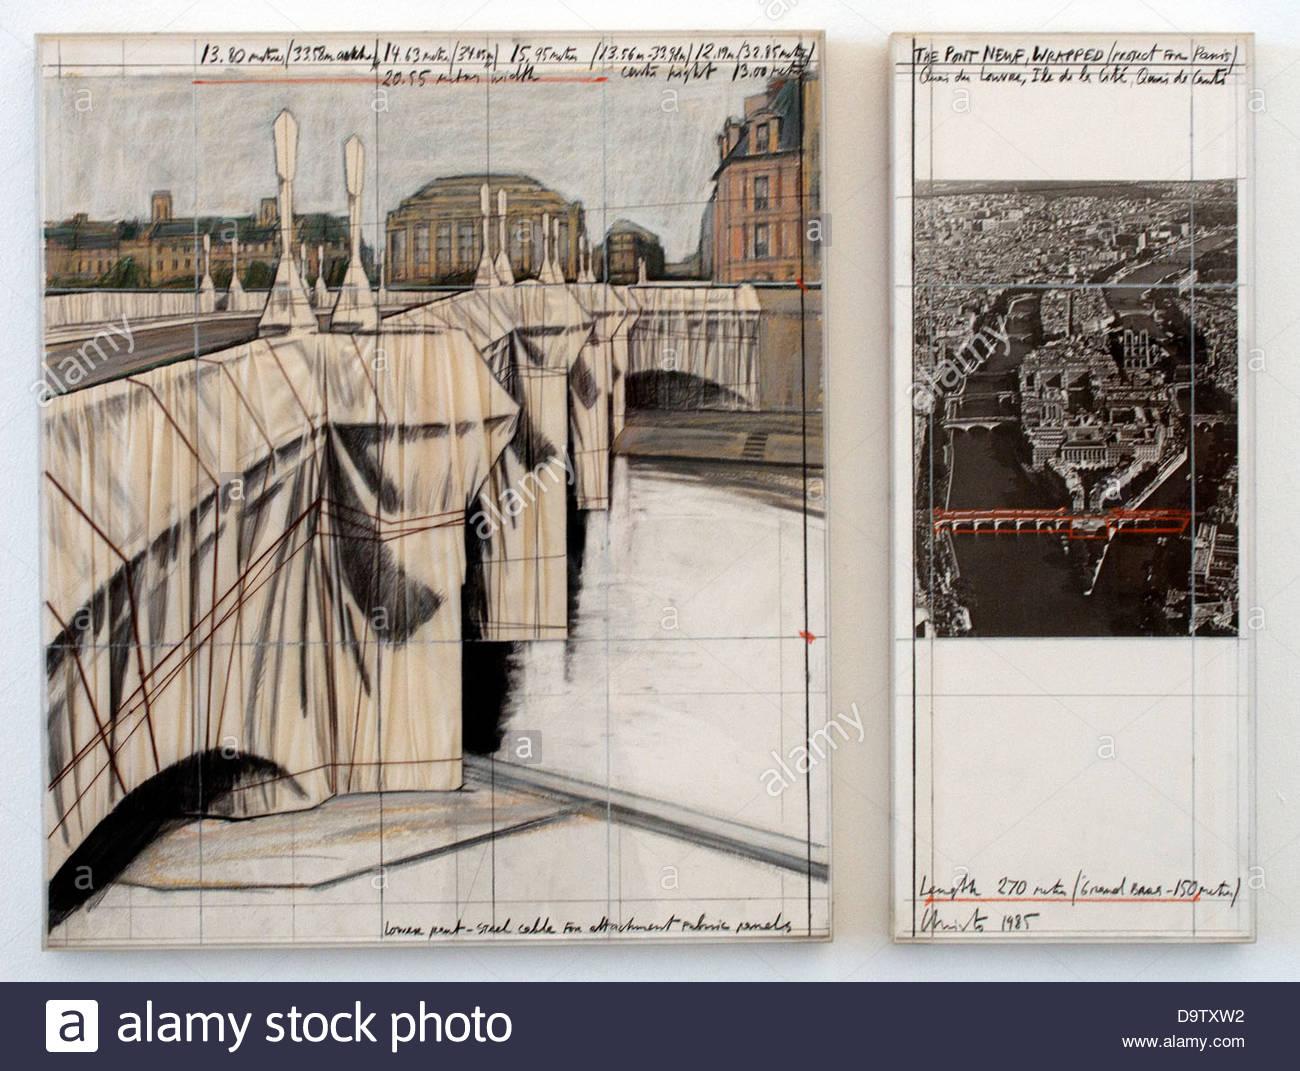 The Pont Neuf Paris 1985 Robert Rauschenberg 1925-2008 American United States of America - Stock Image